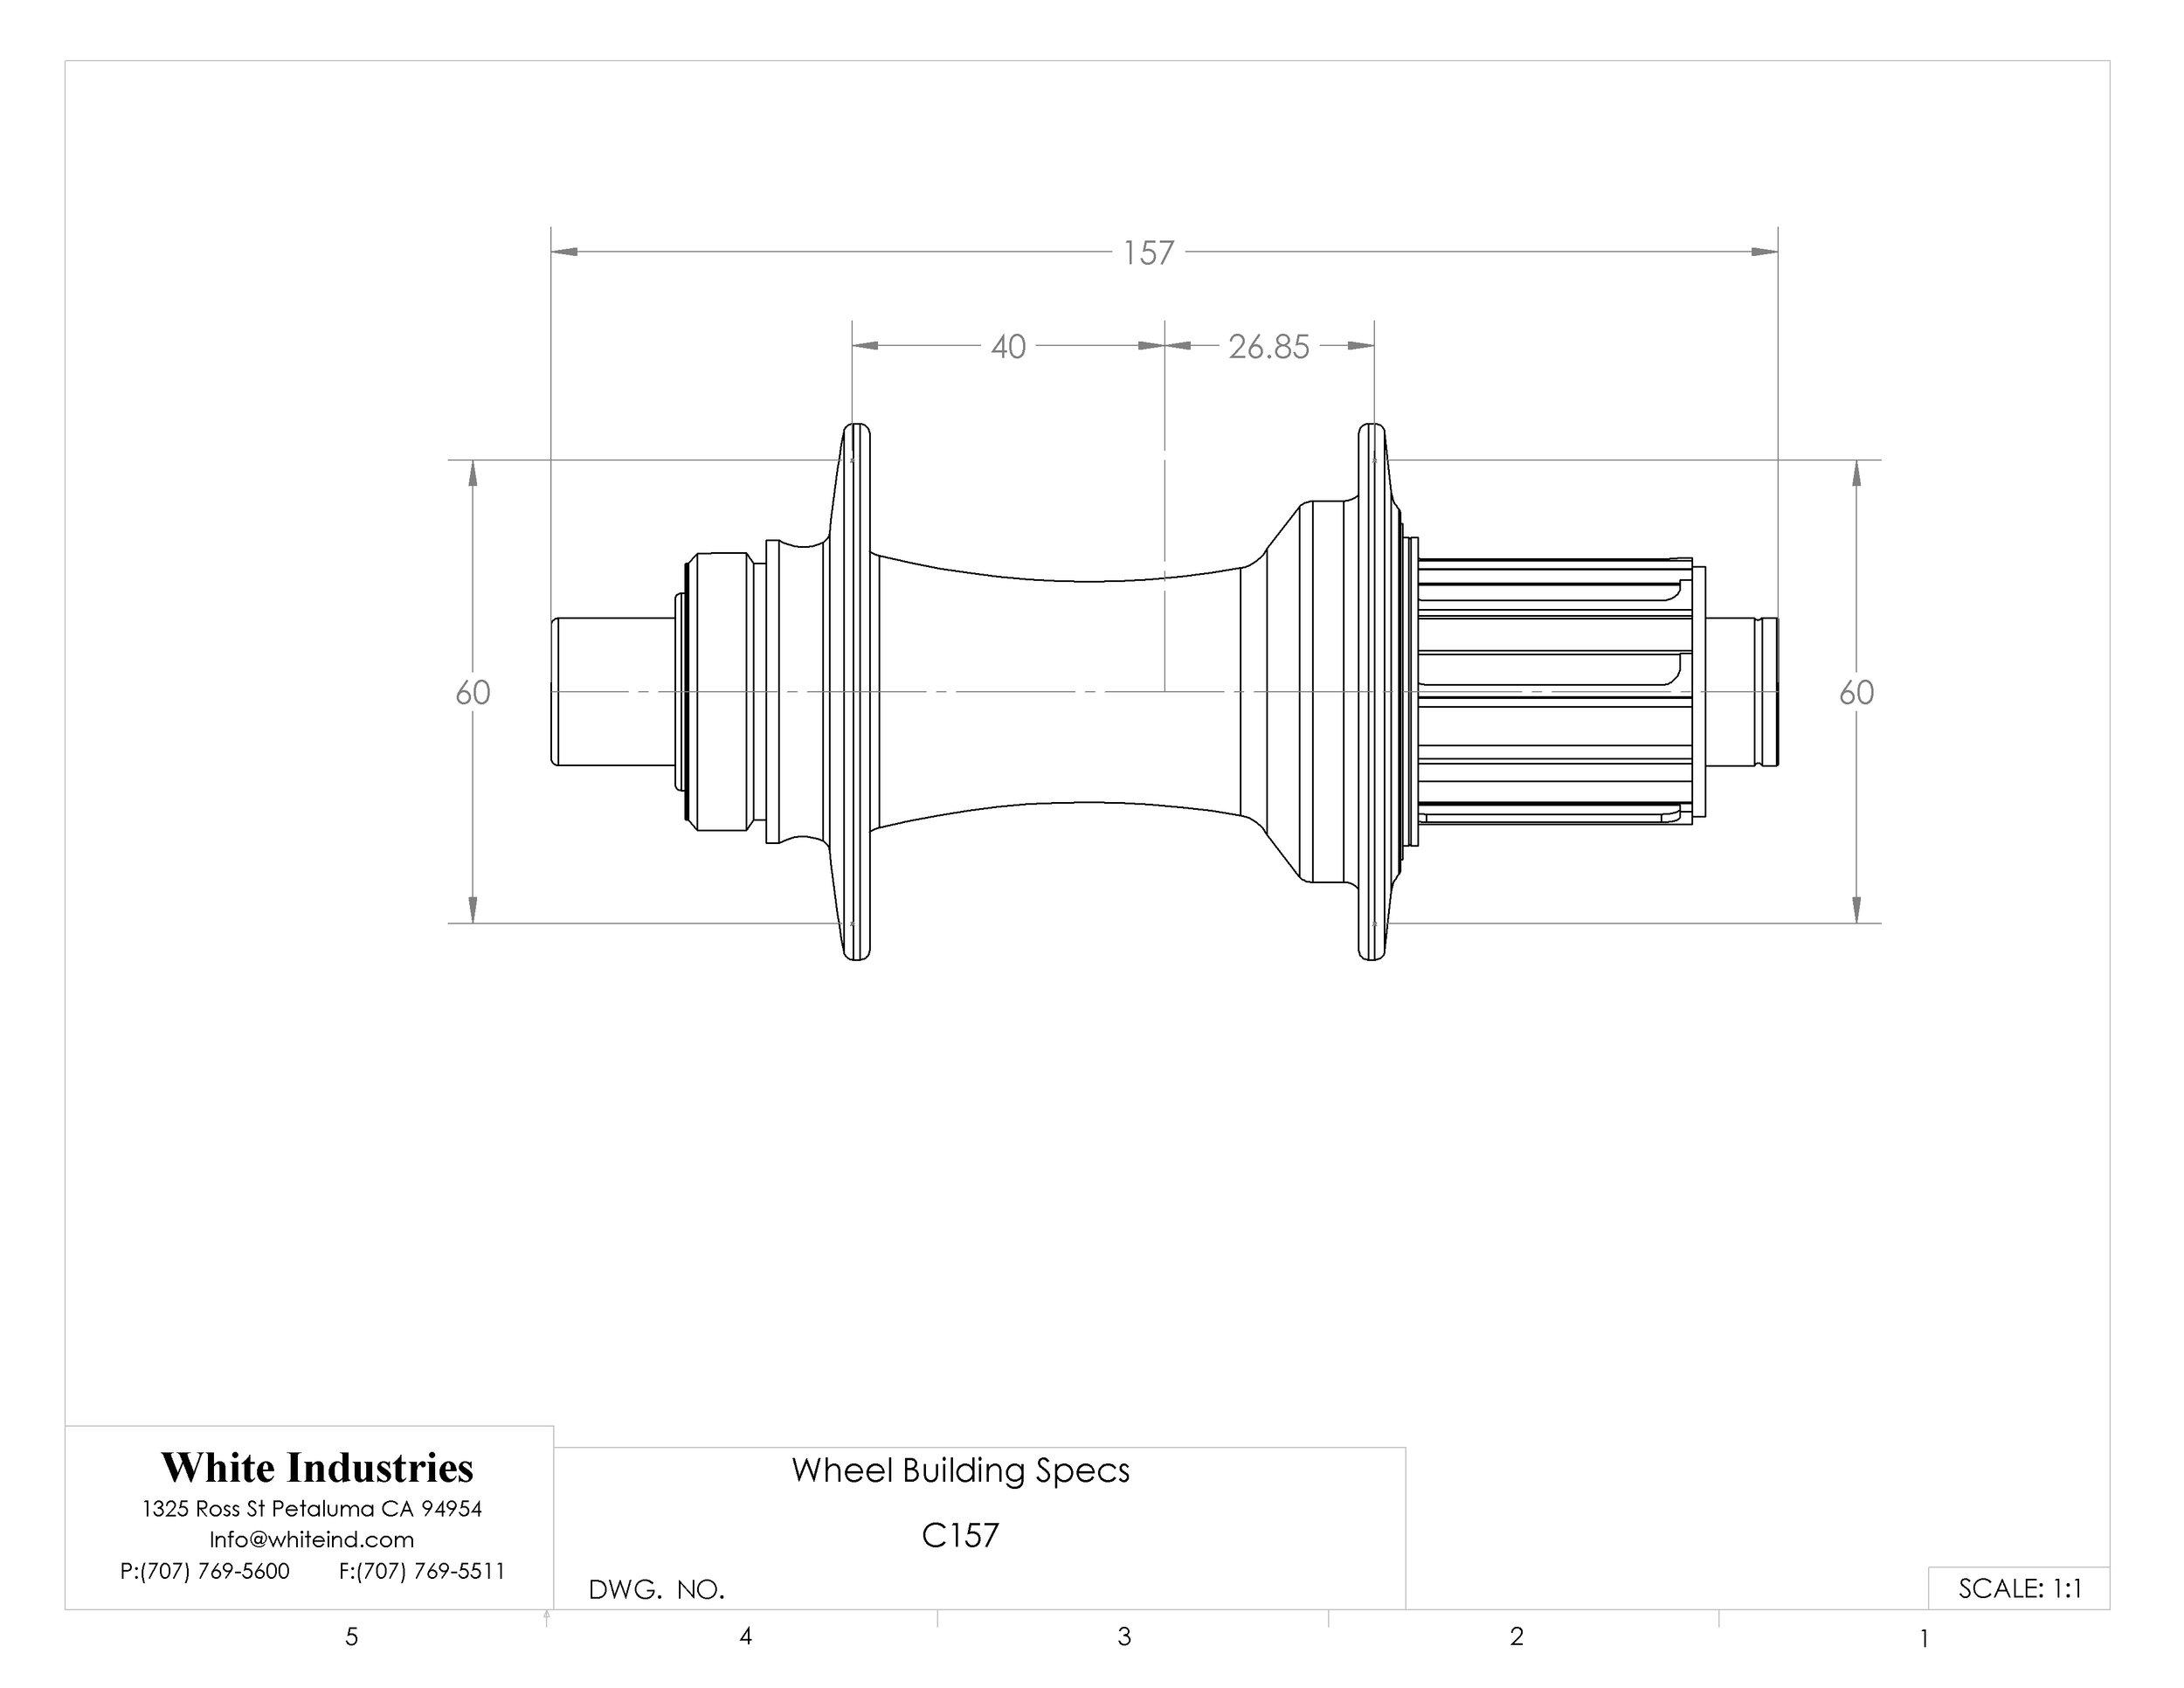 REAR C157 WHEEL BUILDING SPECS.JPG